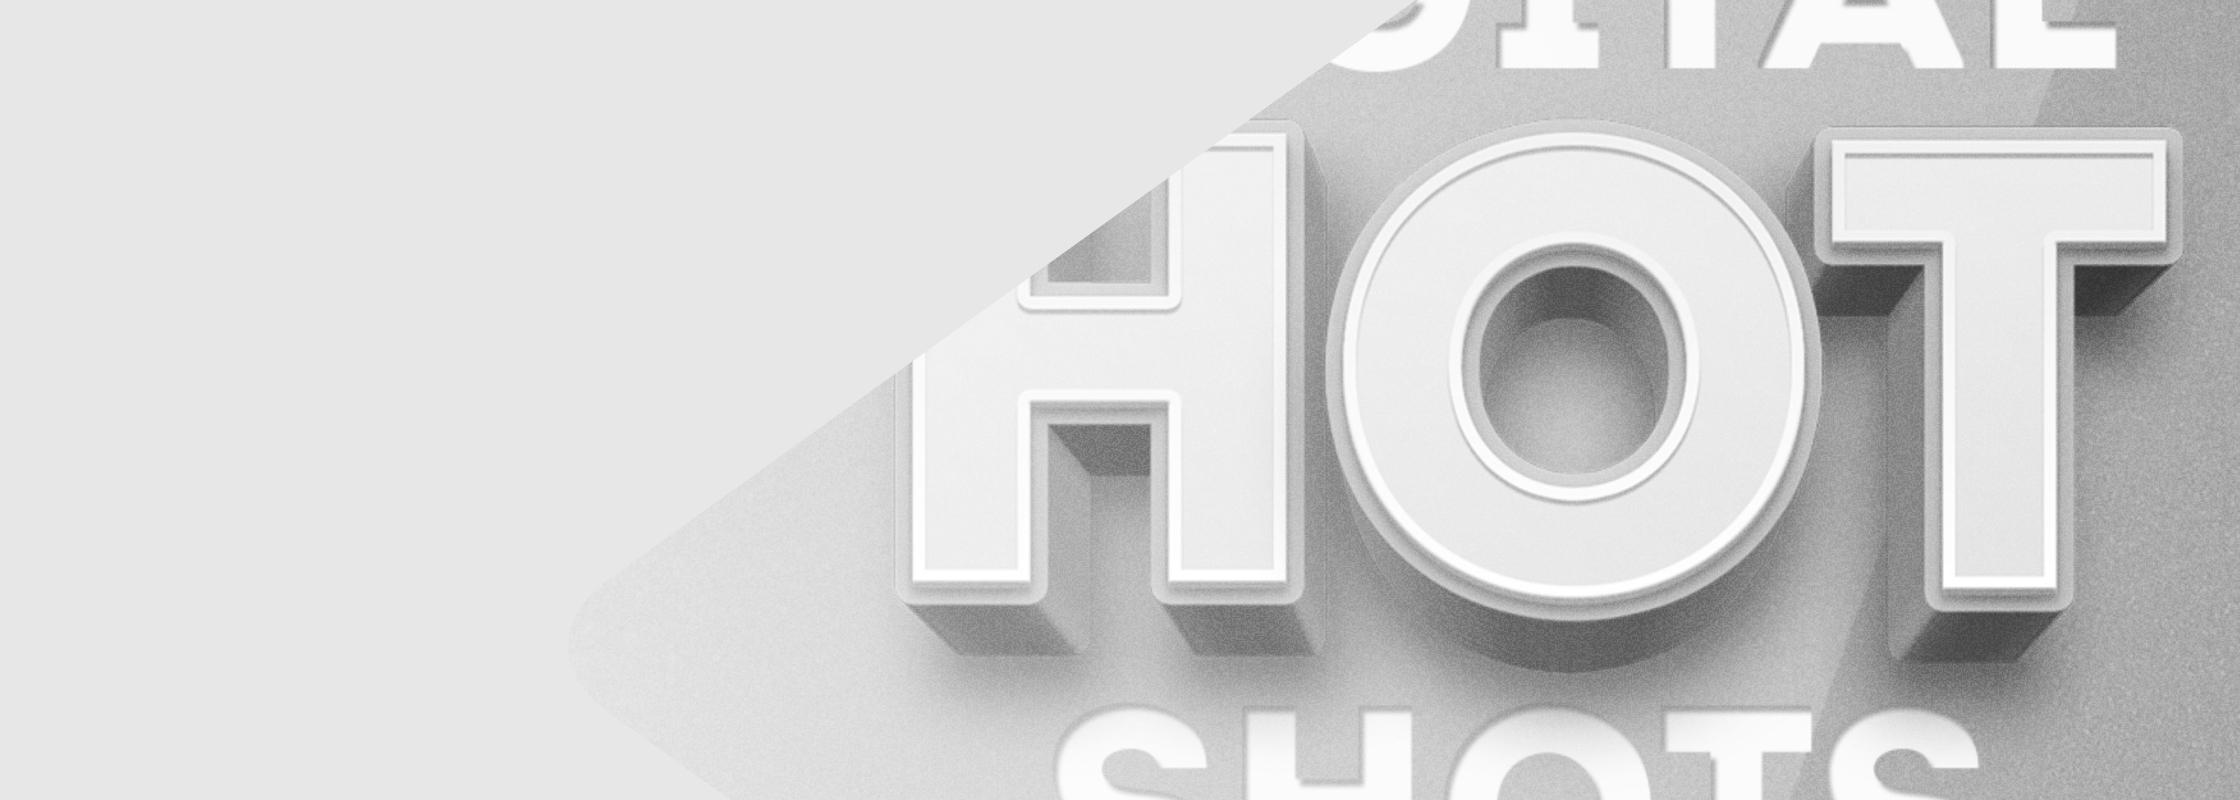 samsiDigital – Digital Hot Shots